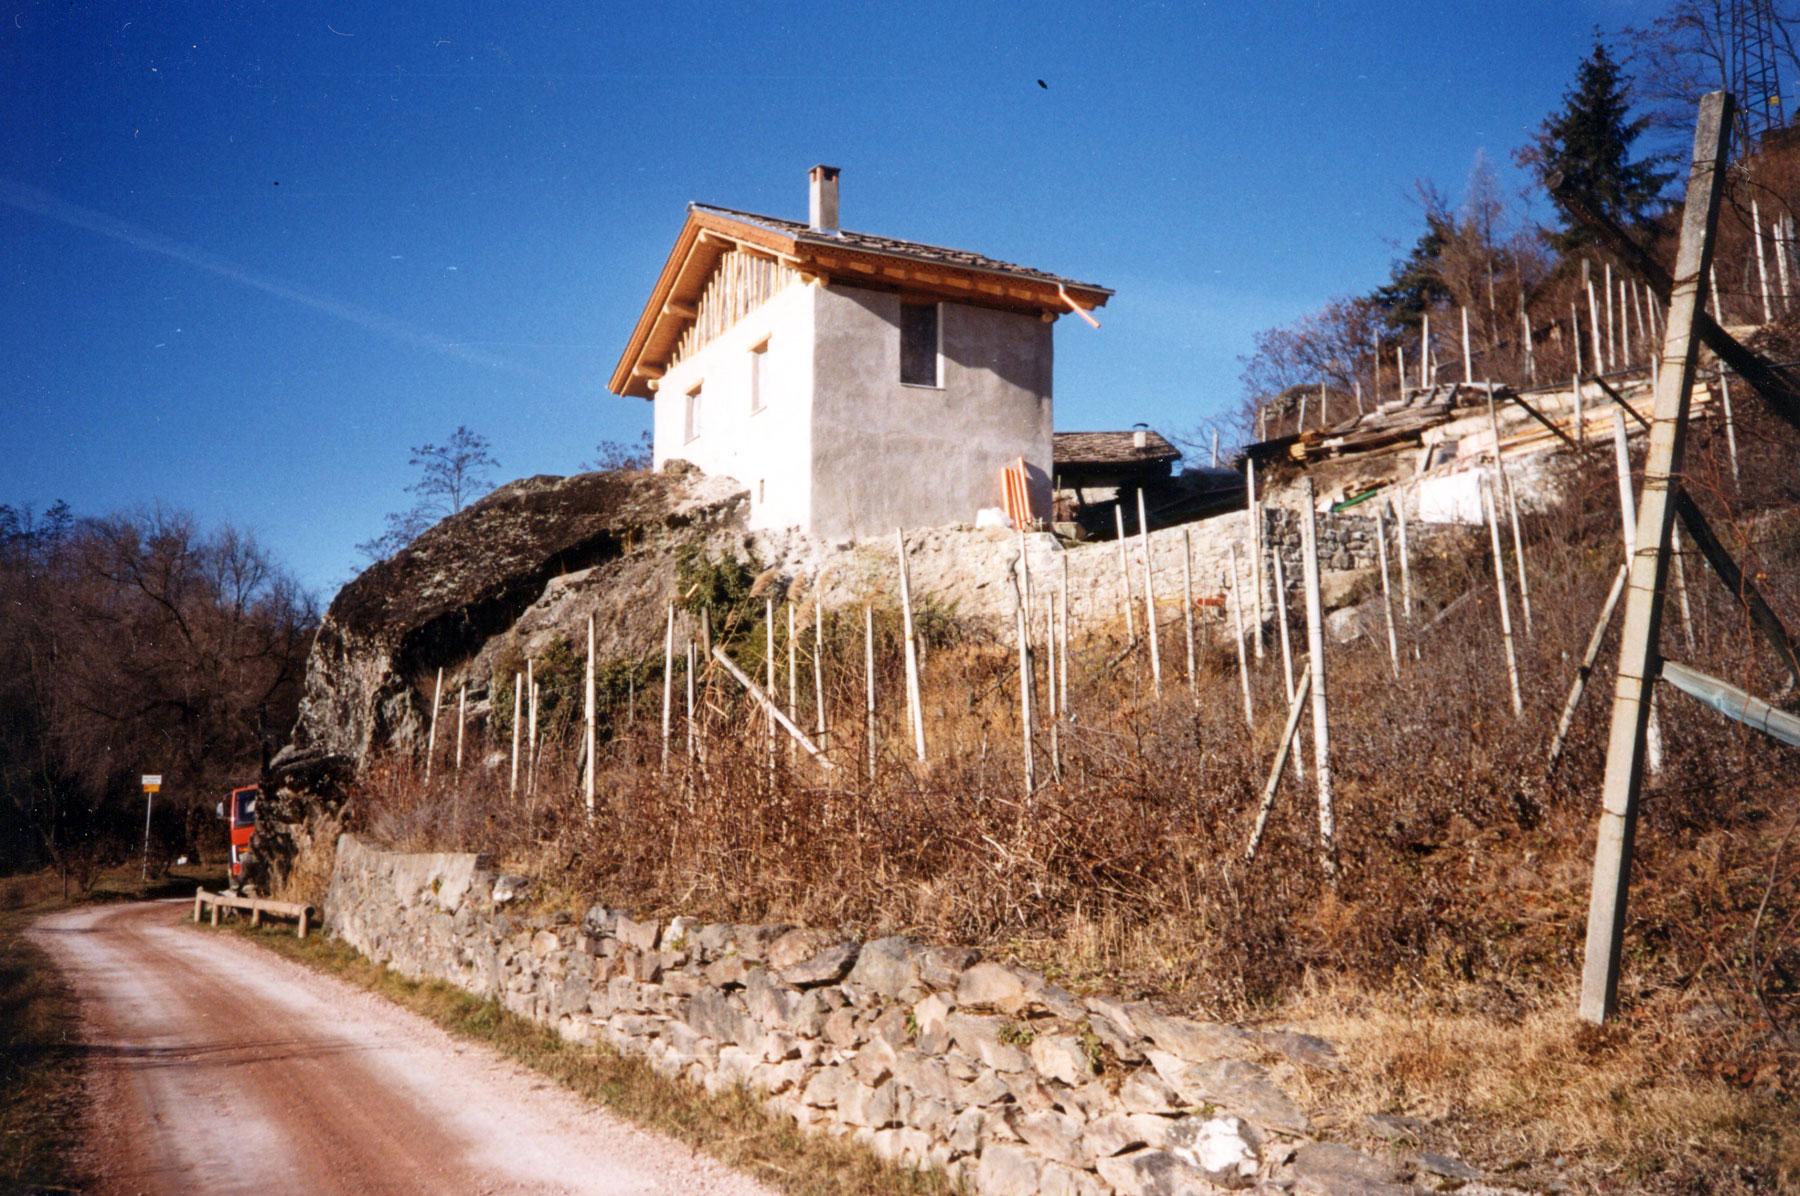 Pergine Valsugana (Trento)